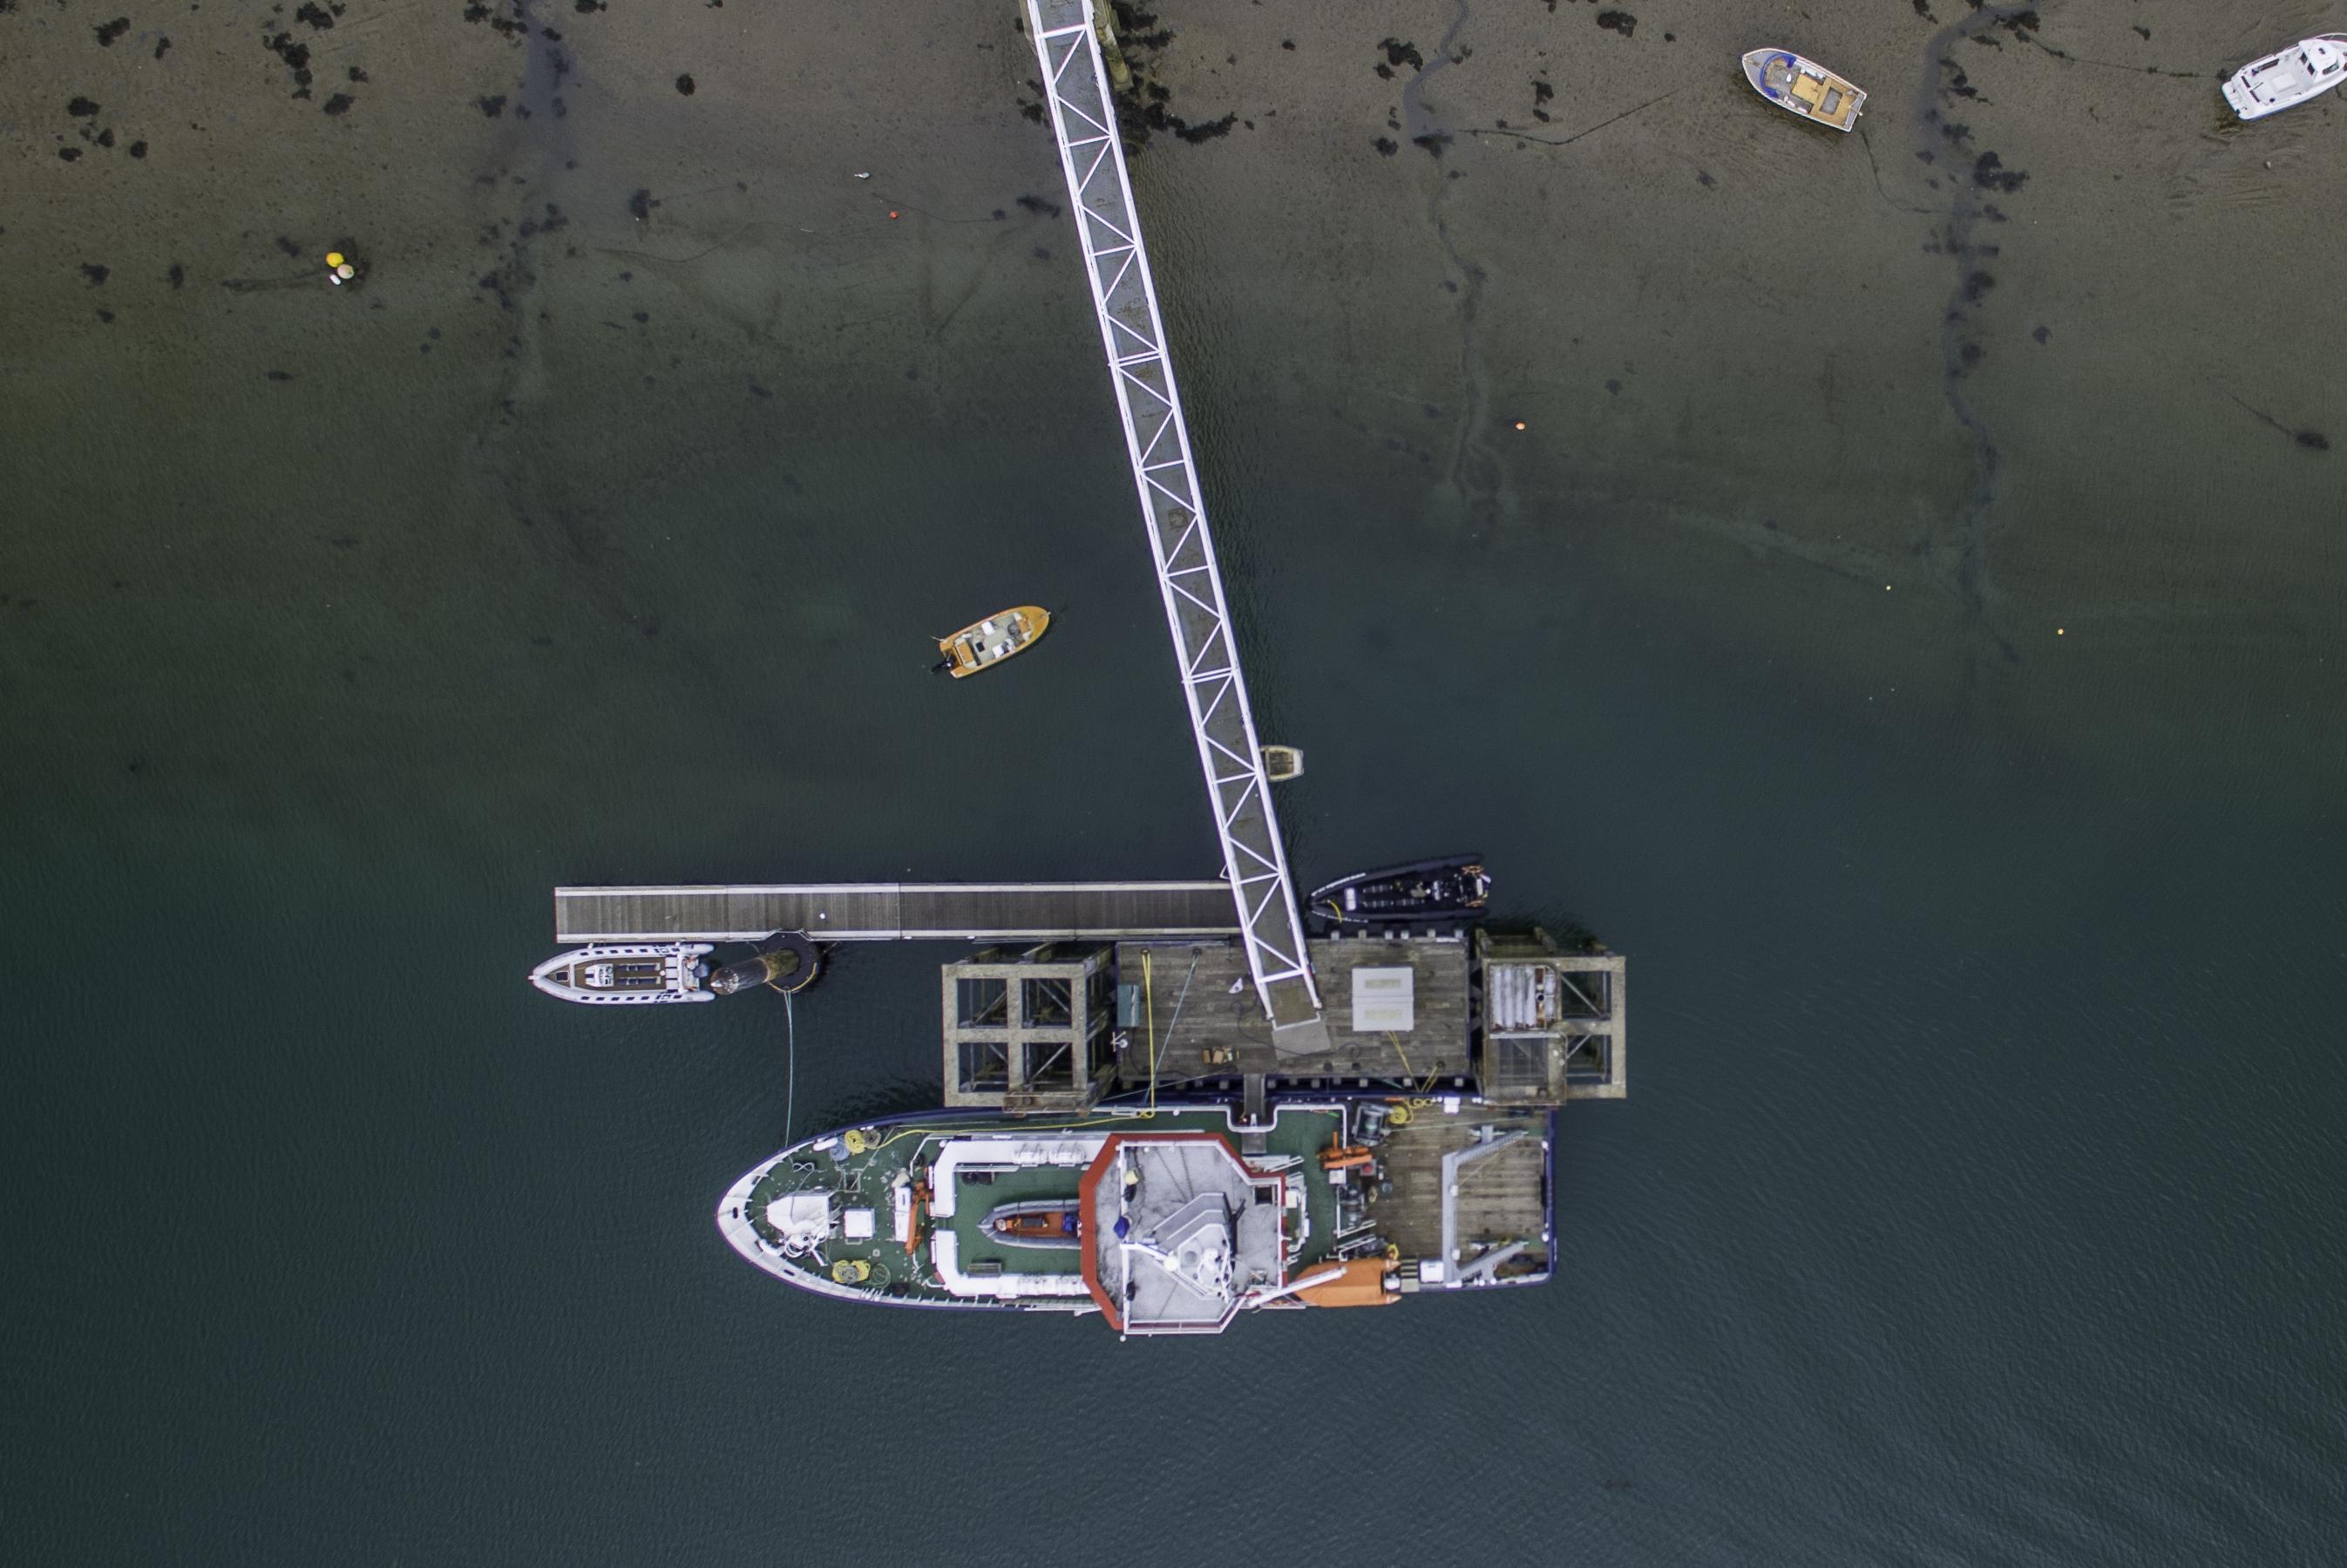 Overhead the Jetty, Bangor